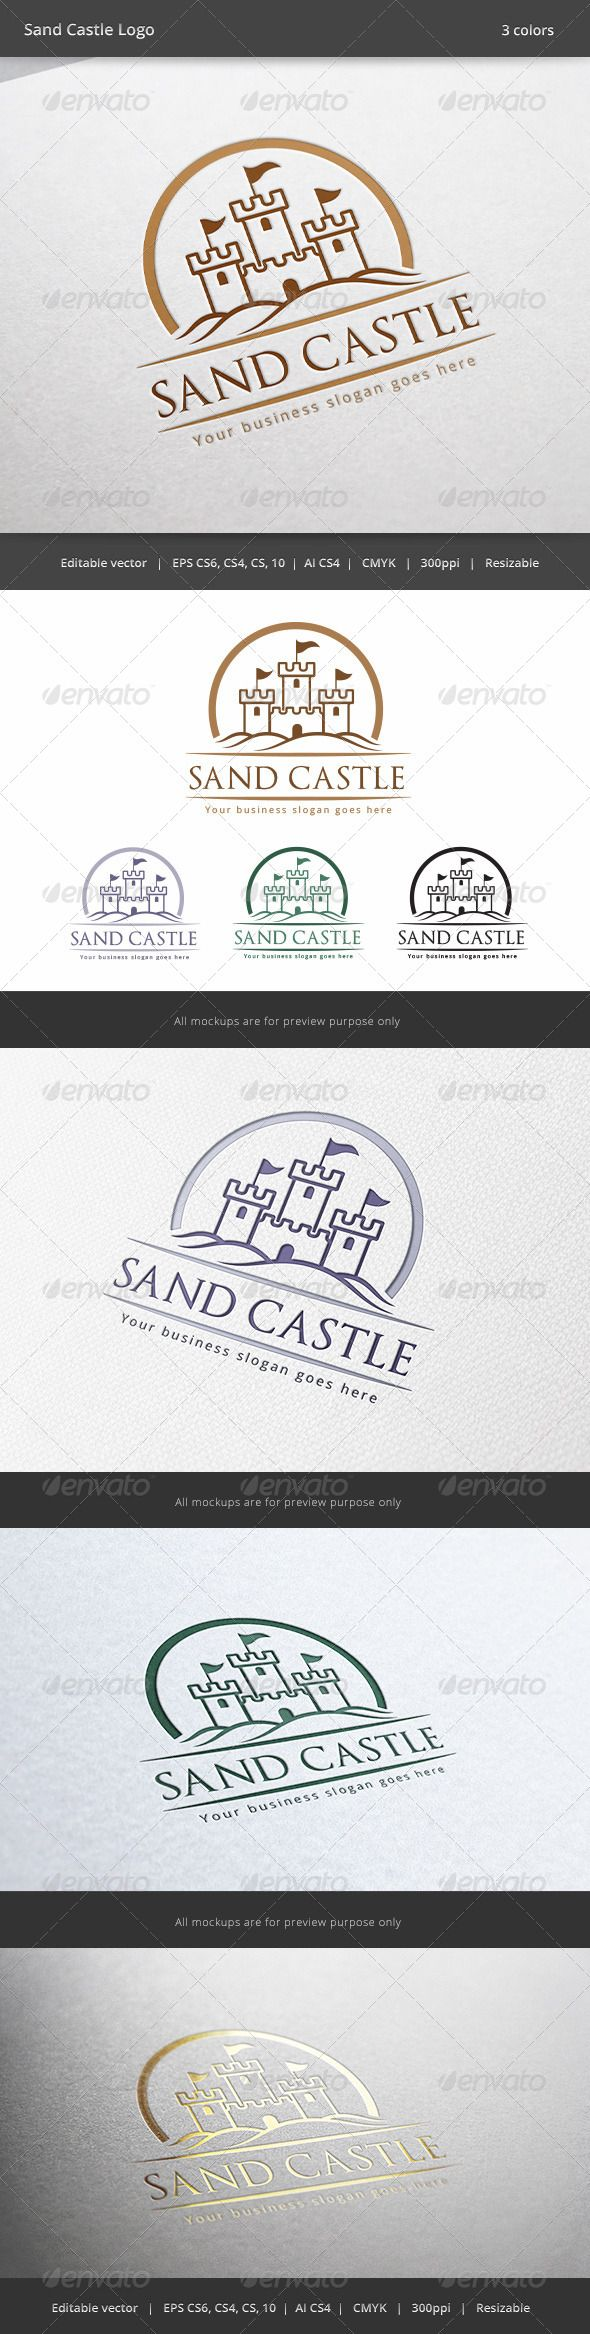 Sand Castle Logo by WheelieMonkey Files format : EPS 10, EPS CS, EPS CS4, EPS CS6, AI CS4 Color mode : CMYK Resolution : 300PPI  Resizable Free used font links i